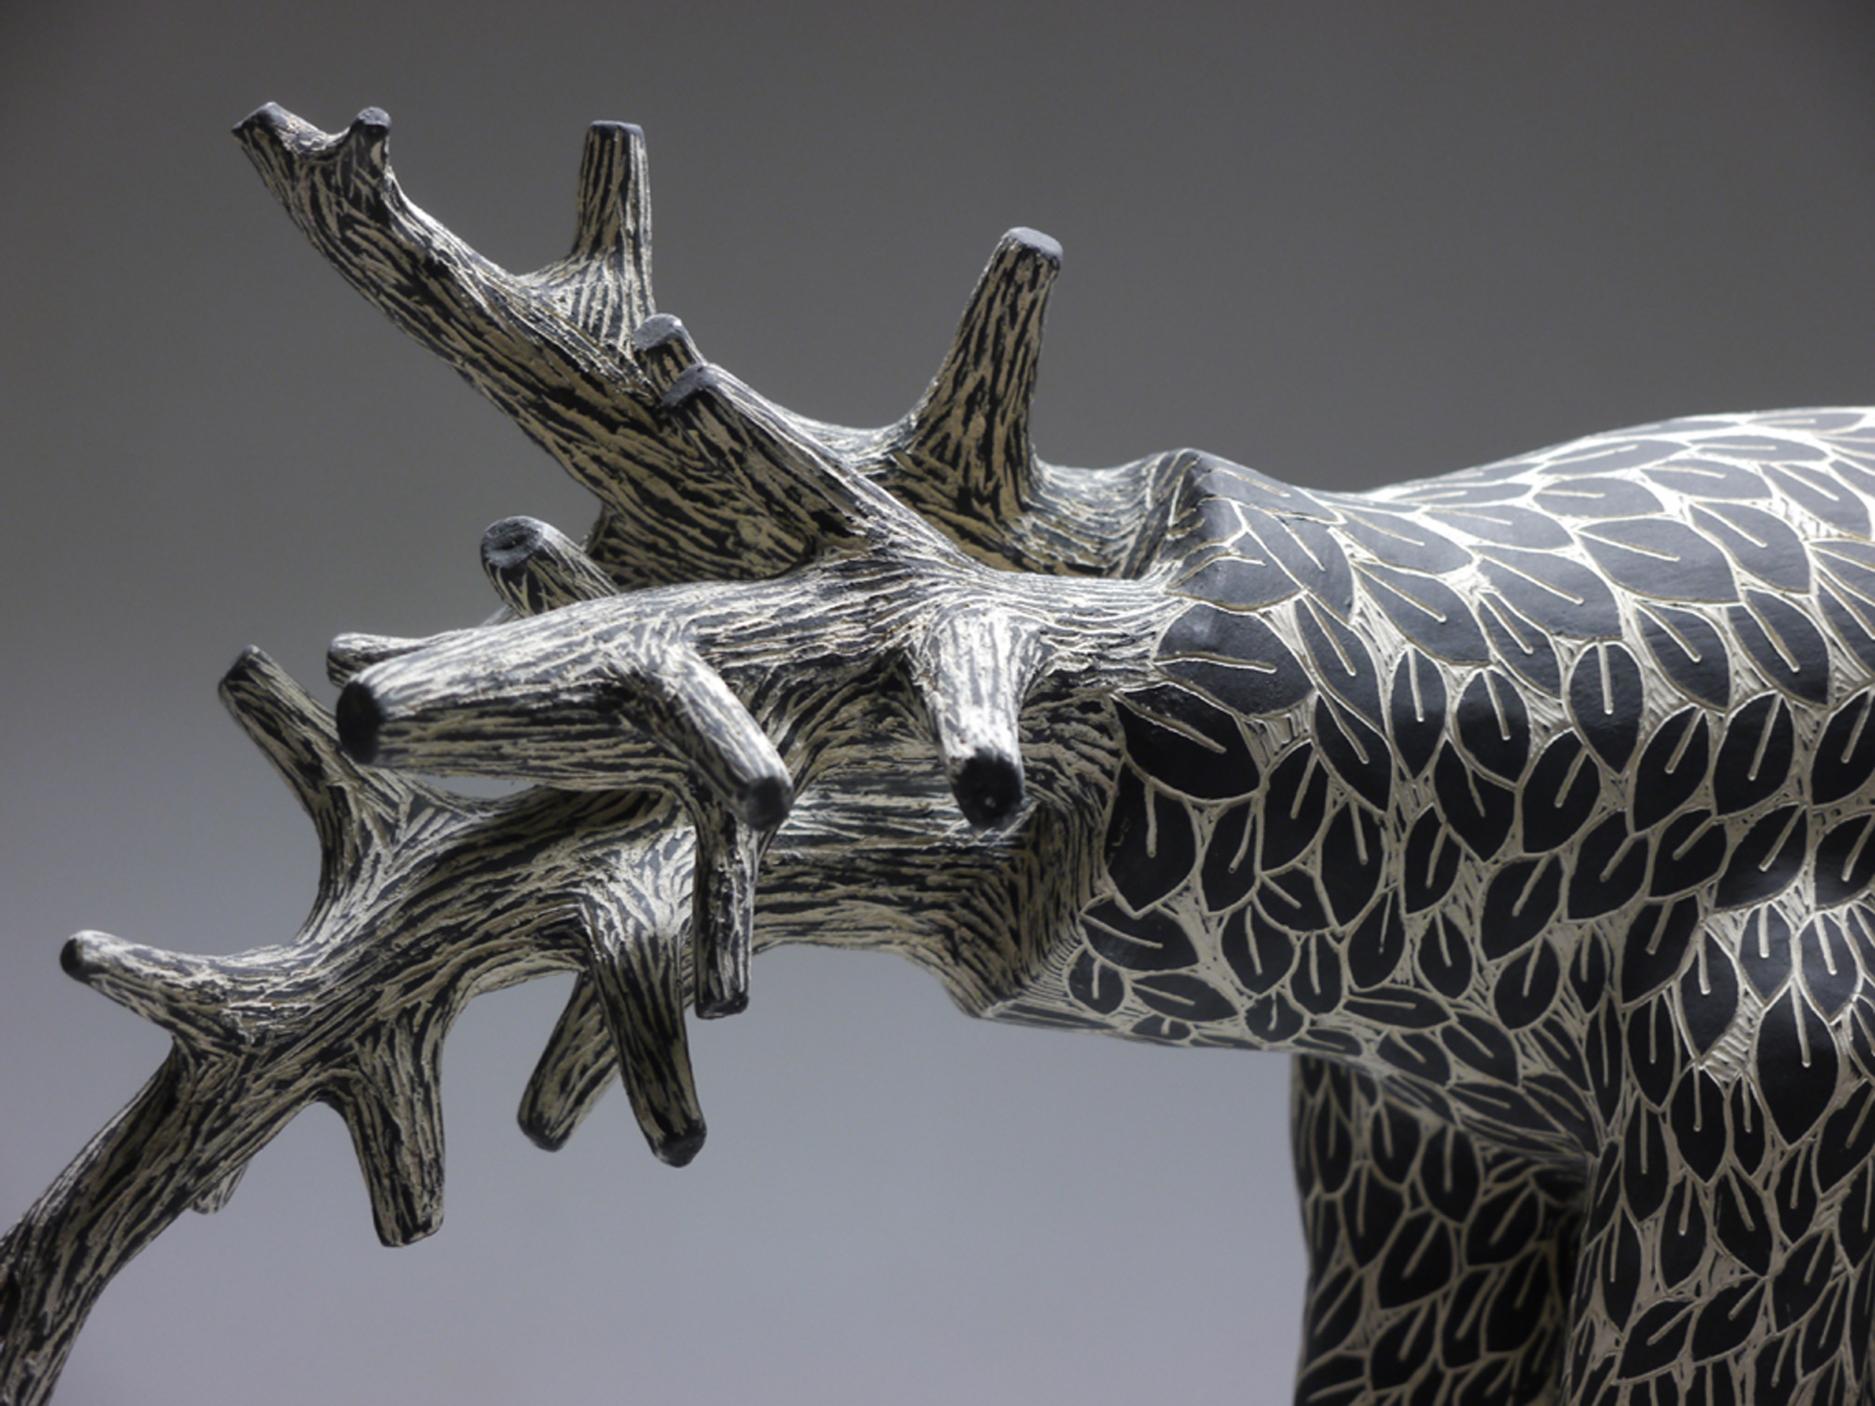 Vegetable Lamb (Detail), 2014